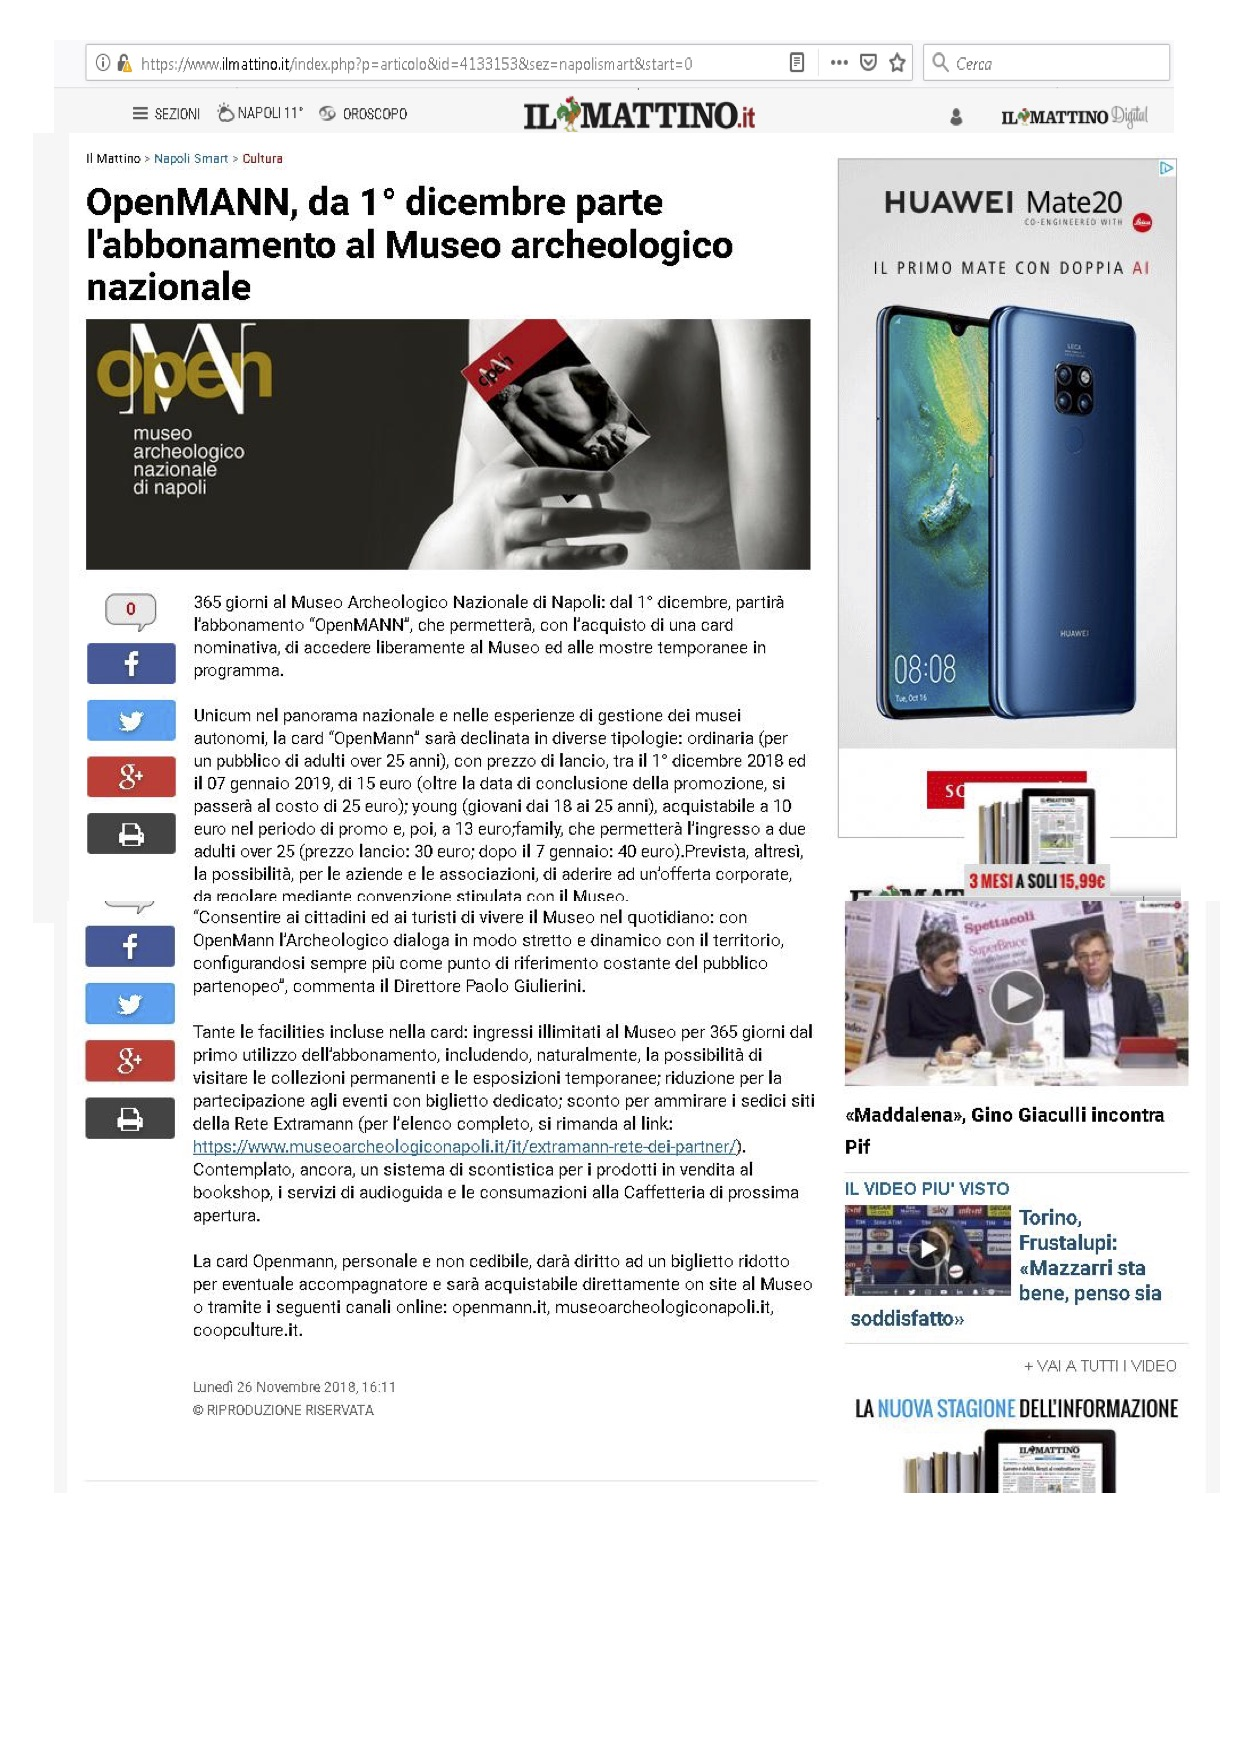 il Mattino 26 nov 2018 OpenMANN